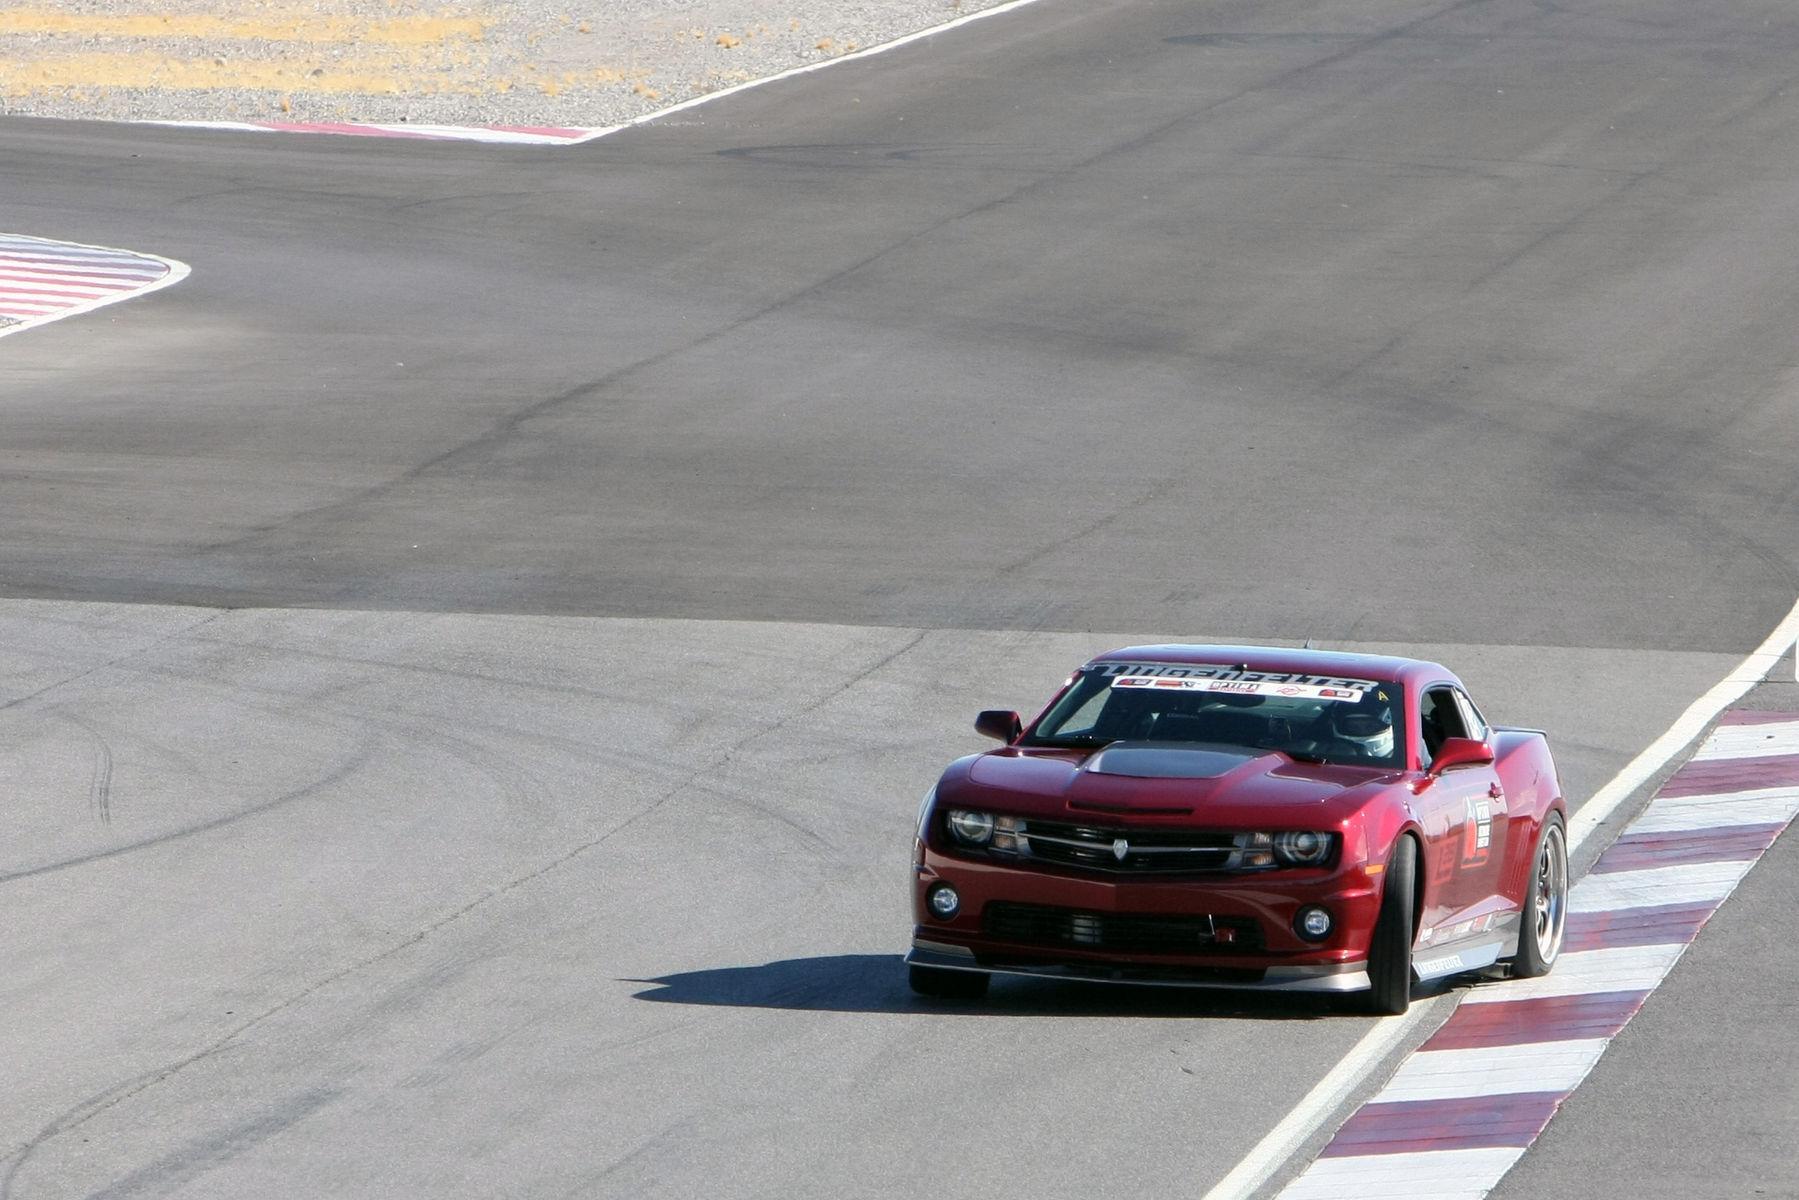 2010 Chevrolet Camaro | 2010 Lingenfelter L28 Camaro - Autocross - Las Vegas, NV - 2